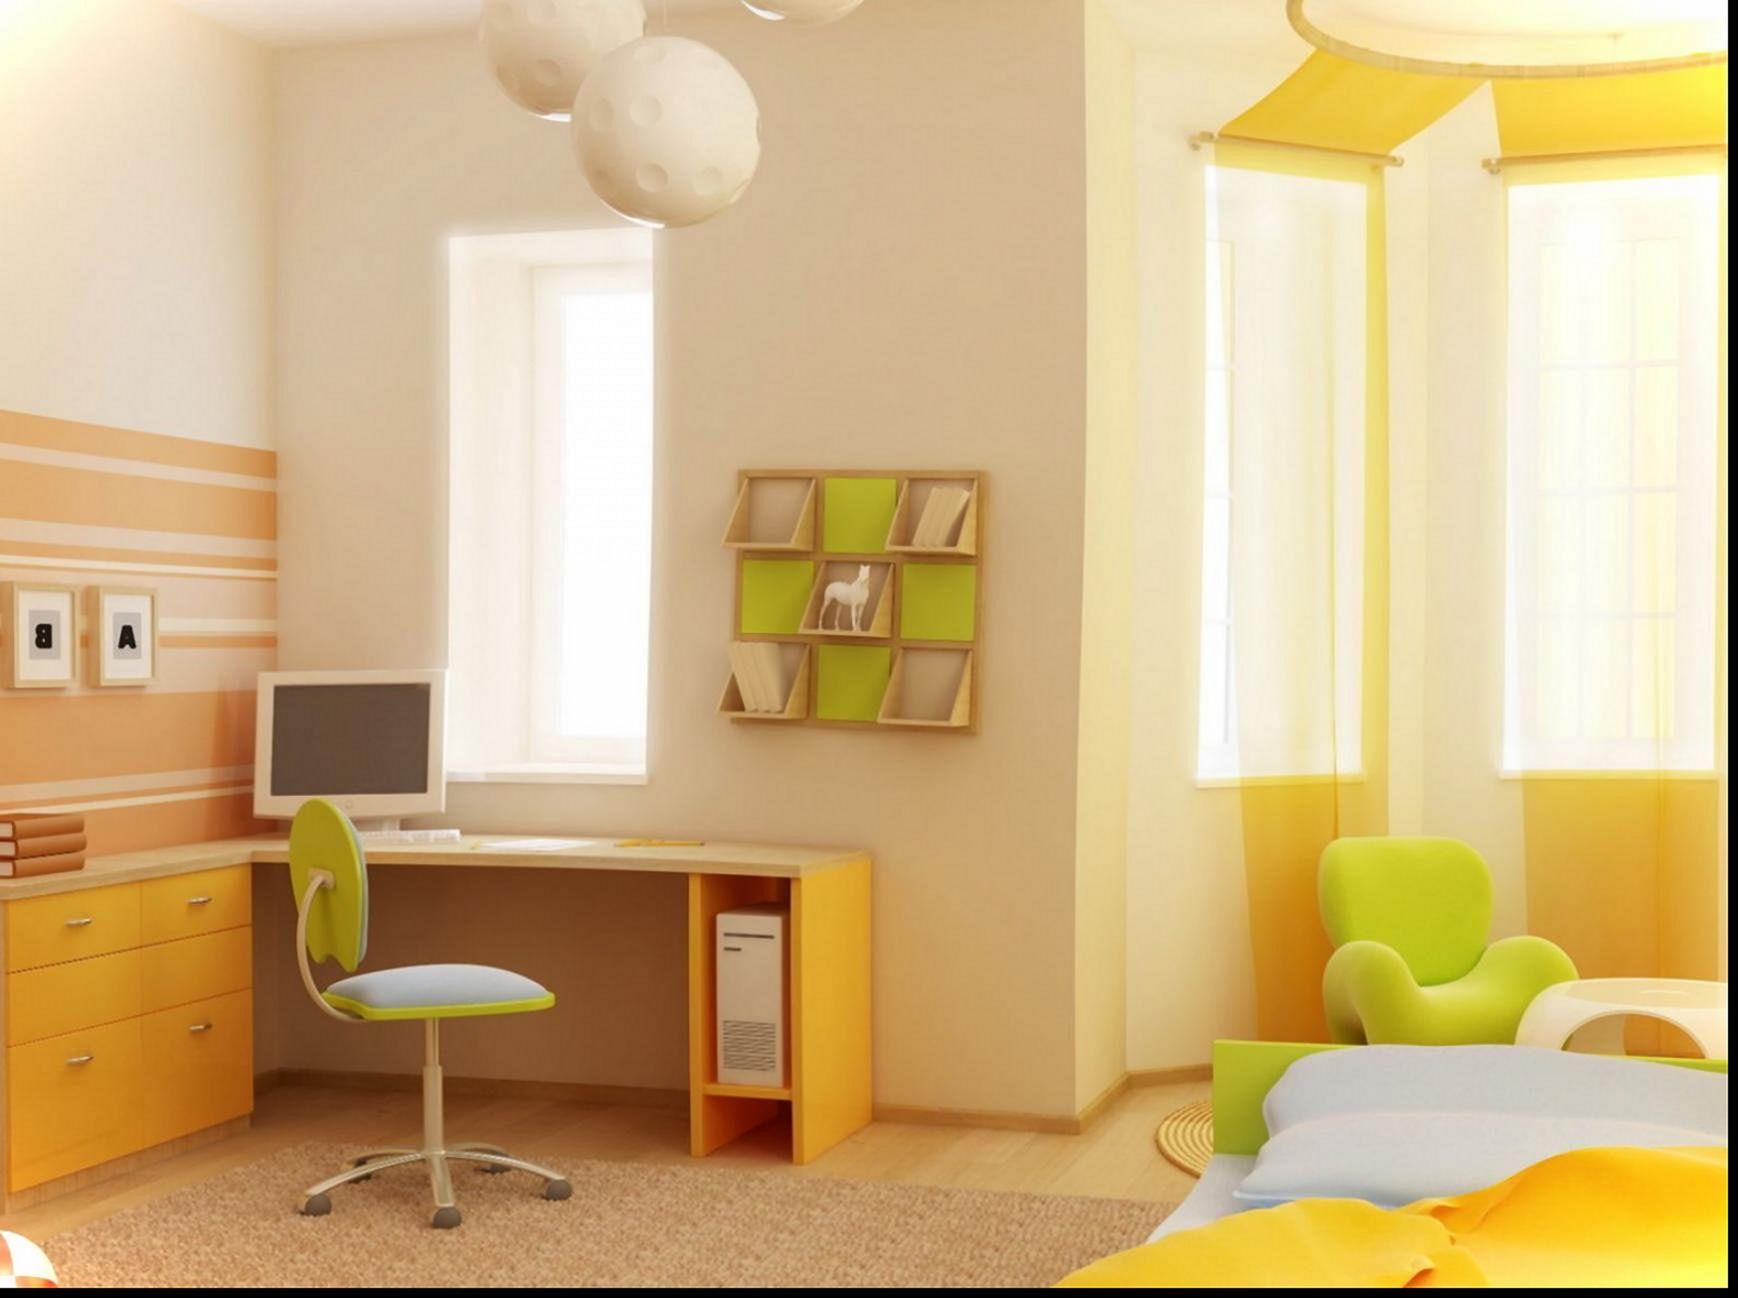 Home Wall Interior Design Ideas 8